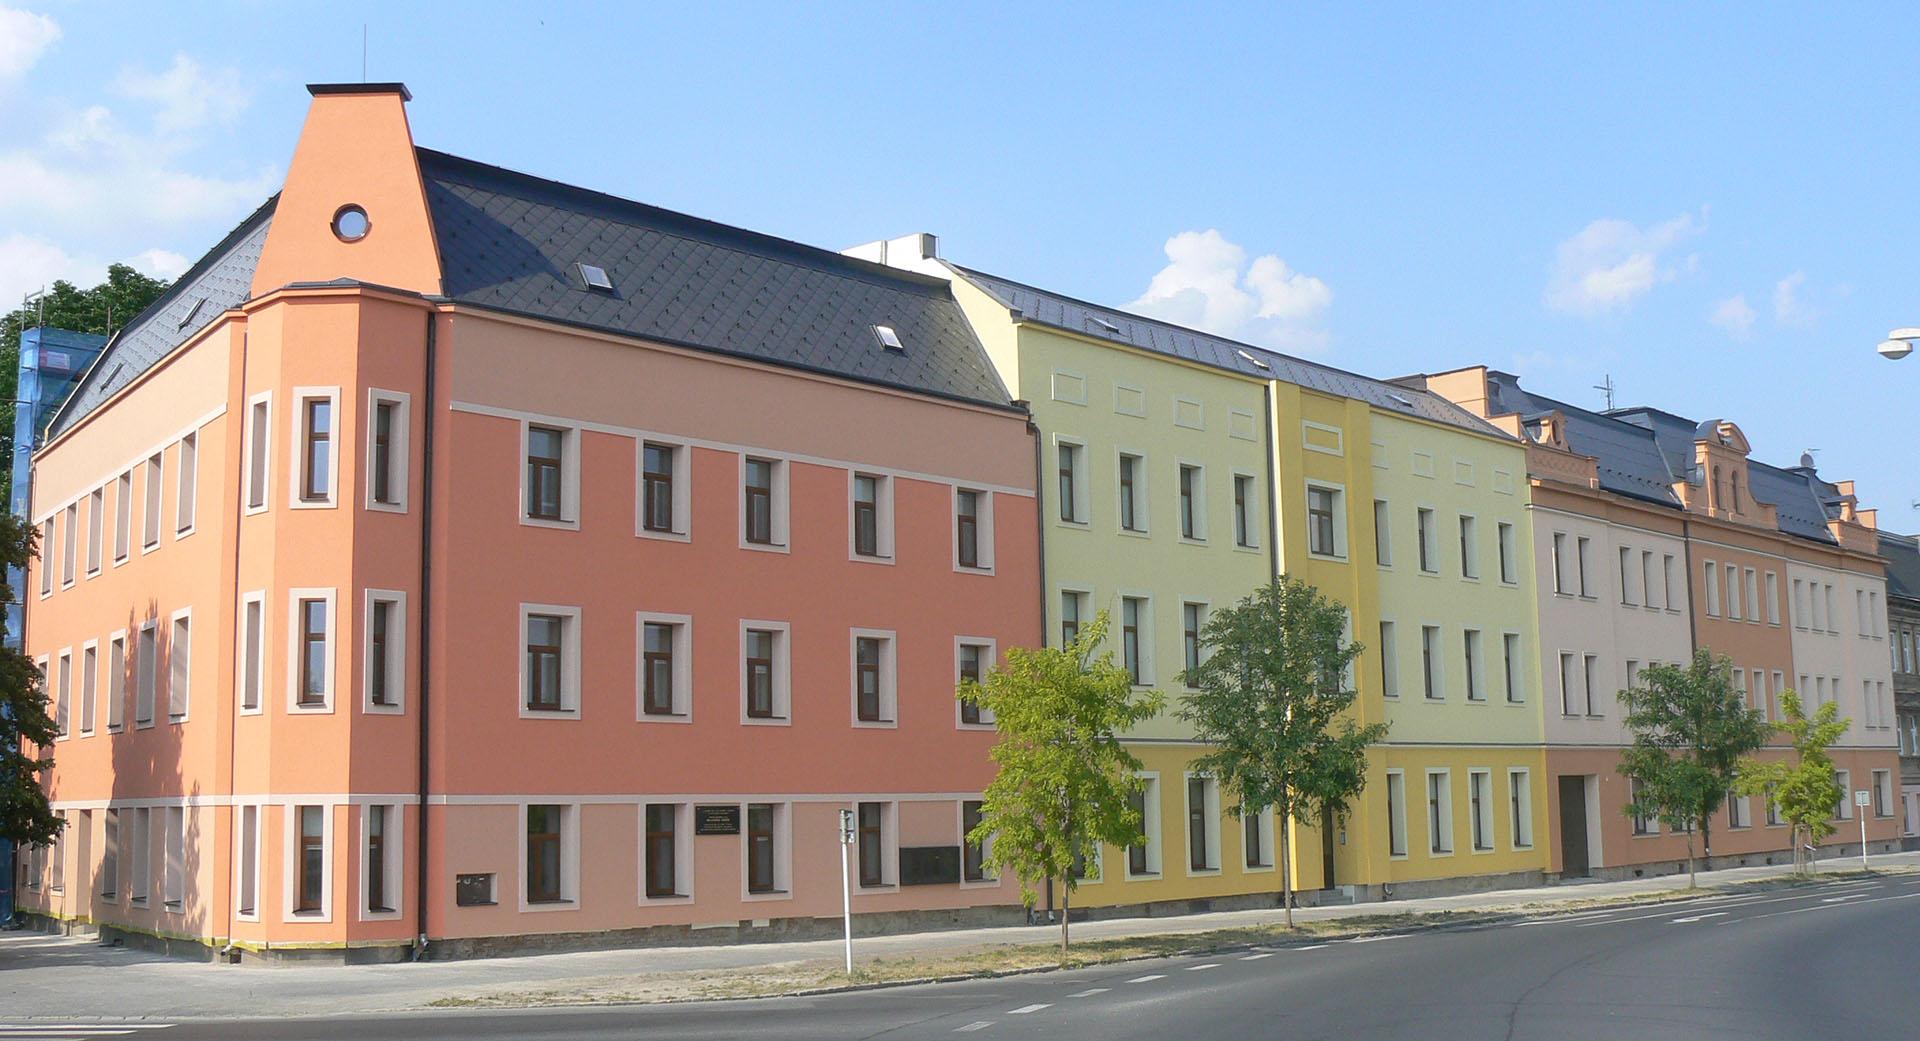 Pohled na školu z ulice